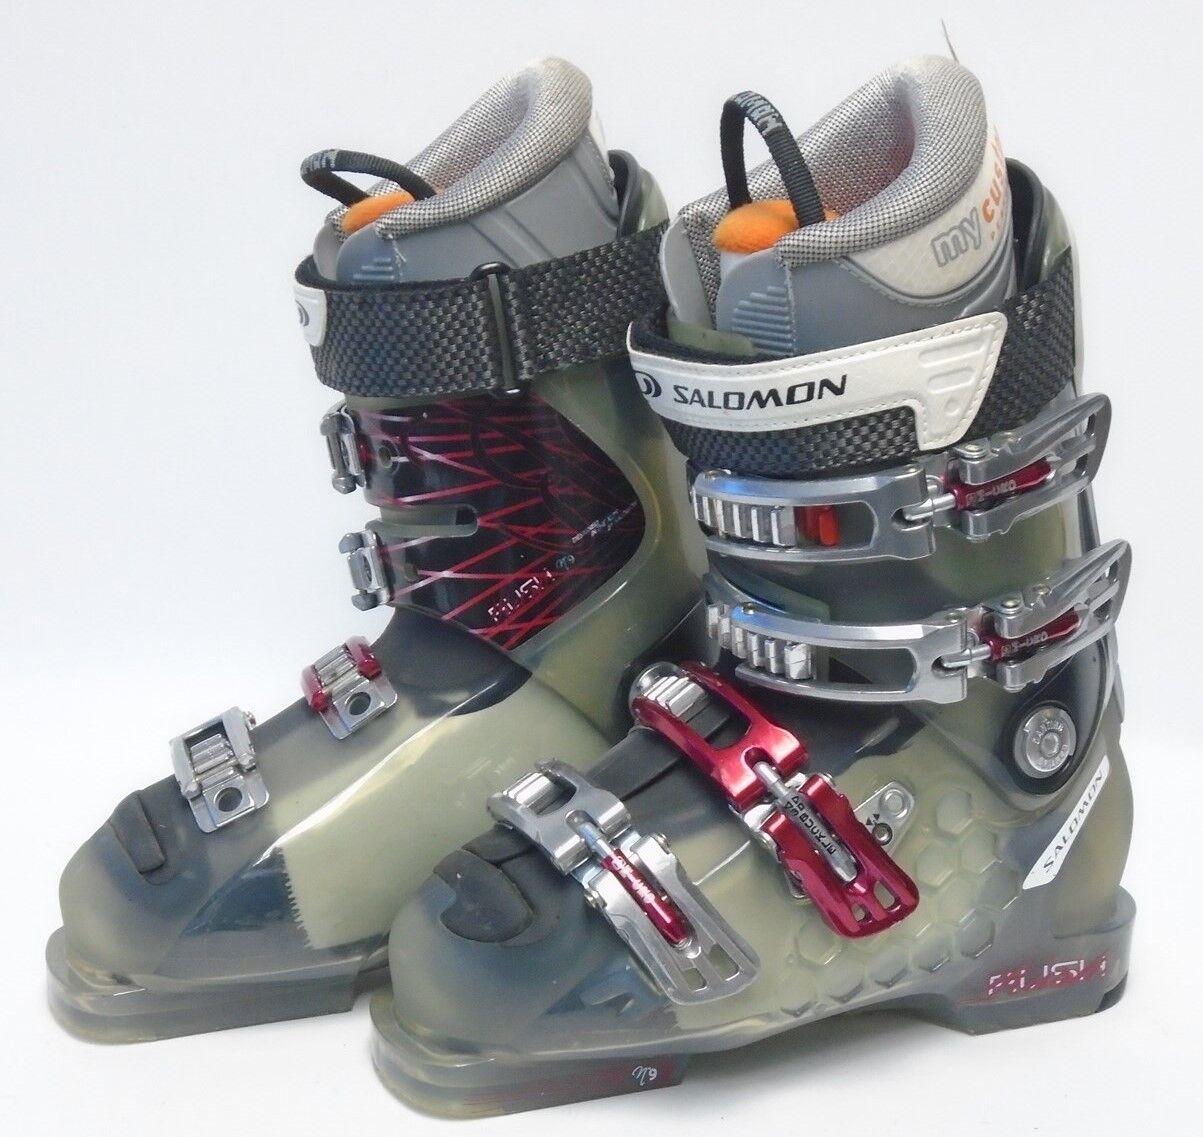 Salomon Rush Women's Ski Boots - Size 5.5   Mondo 23 Used